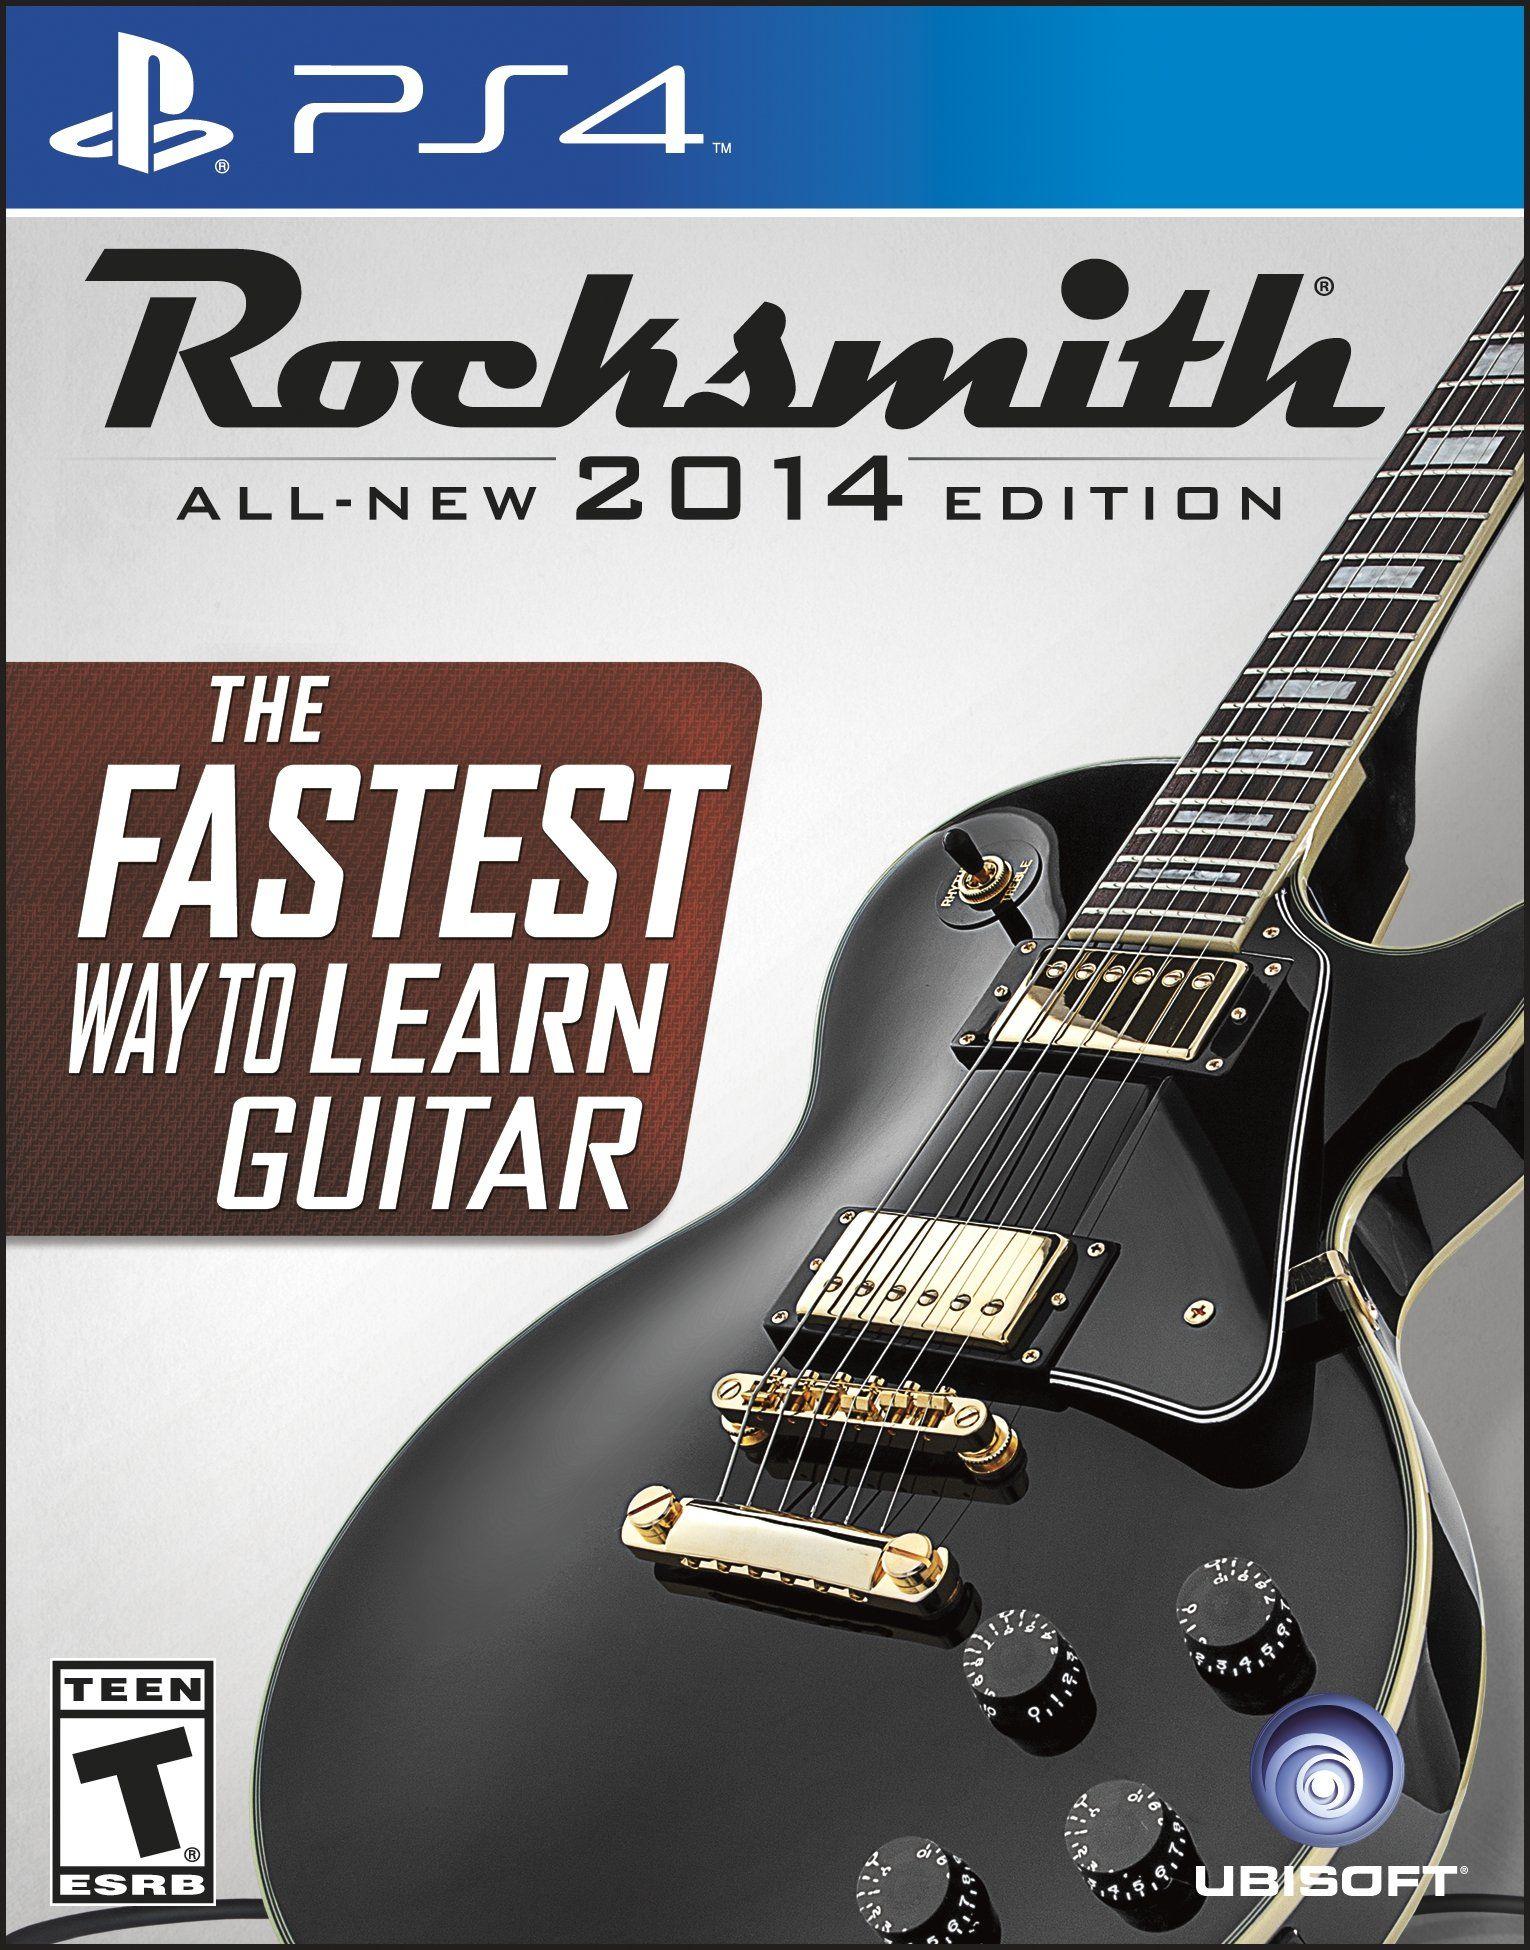 PS4 Rocksmith 2014 playstation 4 Video Games